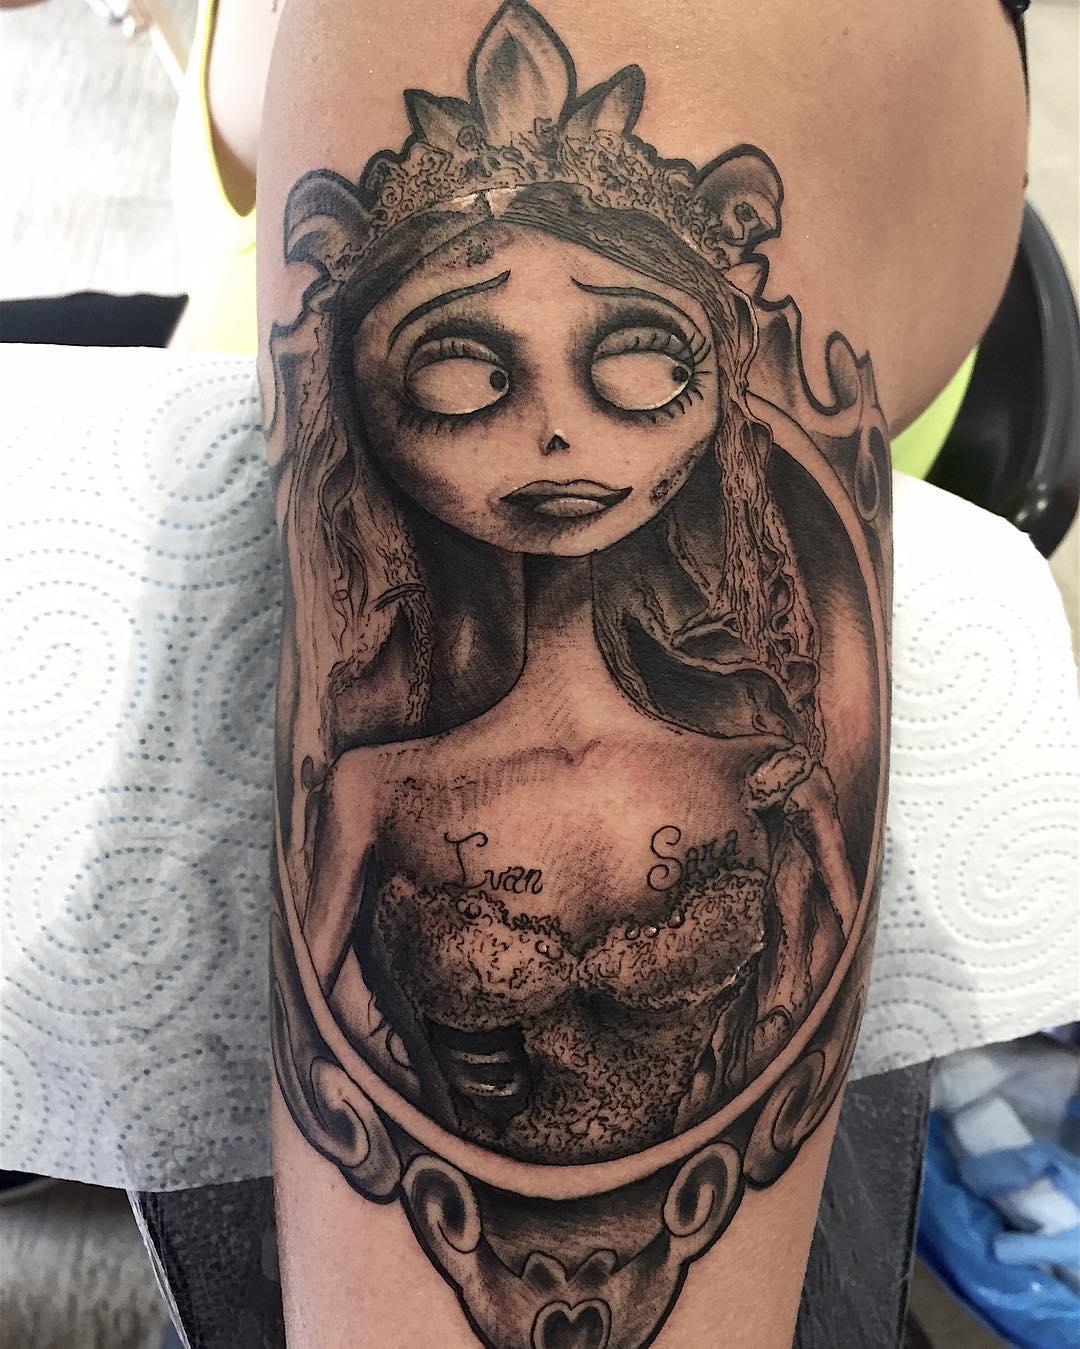 blackandgreytattoo,tattooart,art,artistic,old,oldschollshit,custommade,owl,tabasco,berlintattoo,barcelonatattoo,ibizatattoo,tabascotattooer,bestattooers,tradicionaltattooers,bestisbest,tatuajes,berlintattooers,ontheroad,classictattoo,tendencia